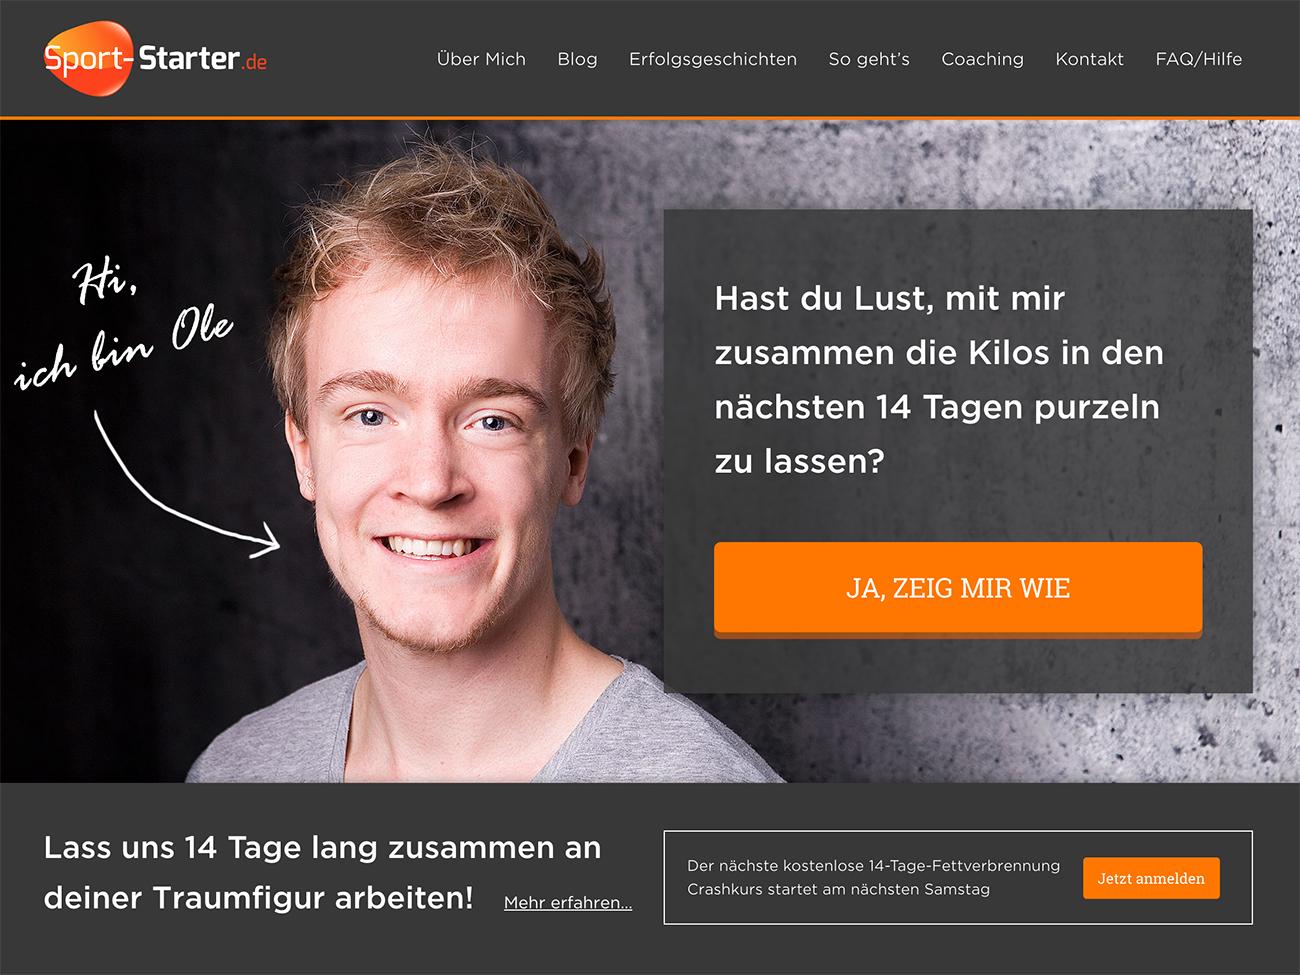 sport-starter.de, sports and fitness blog